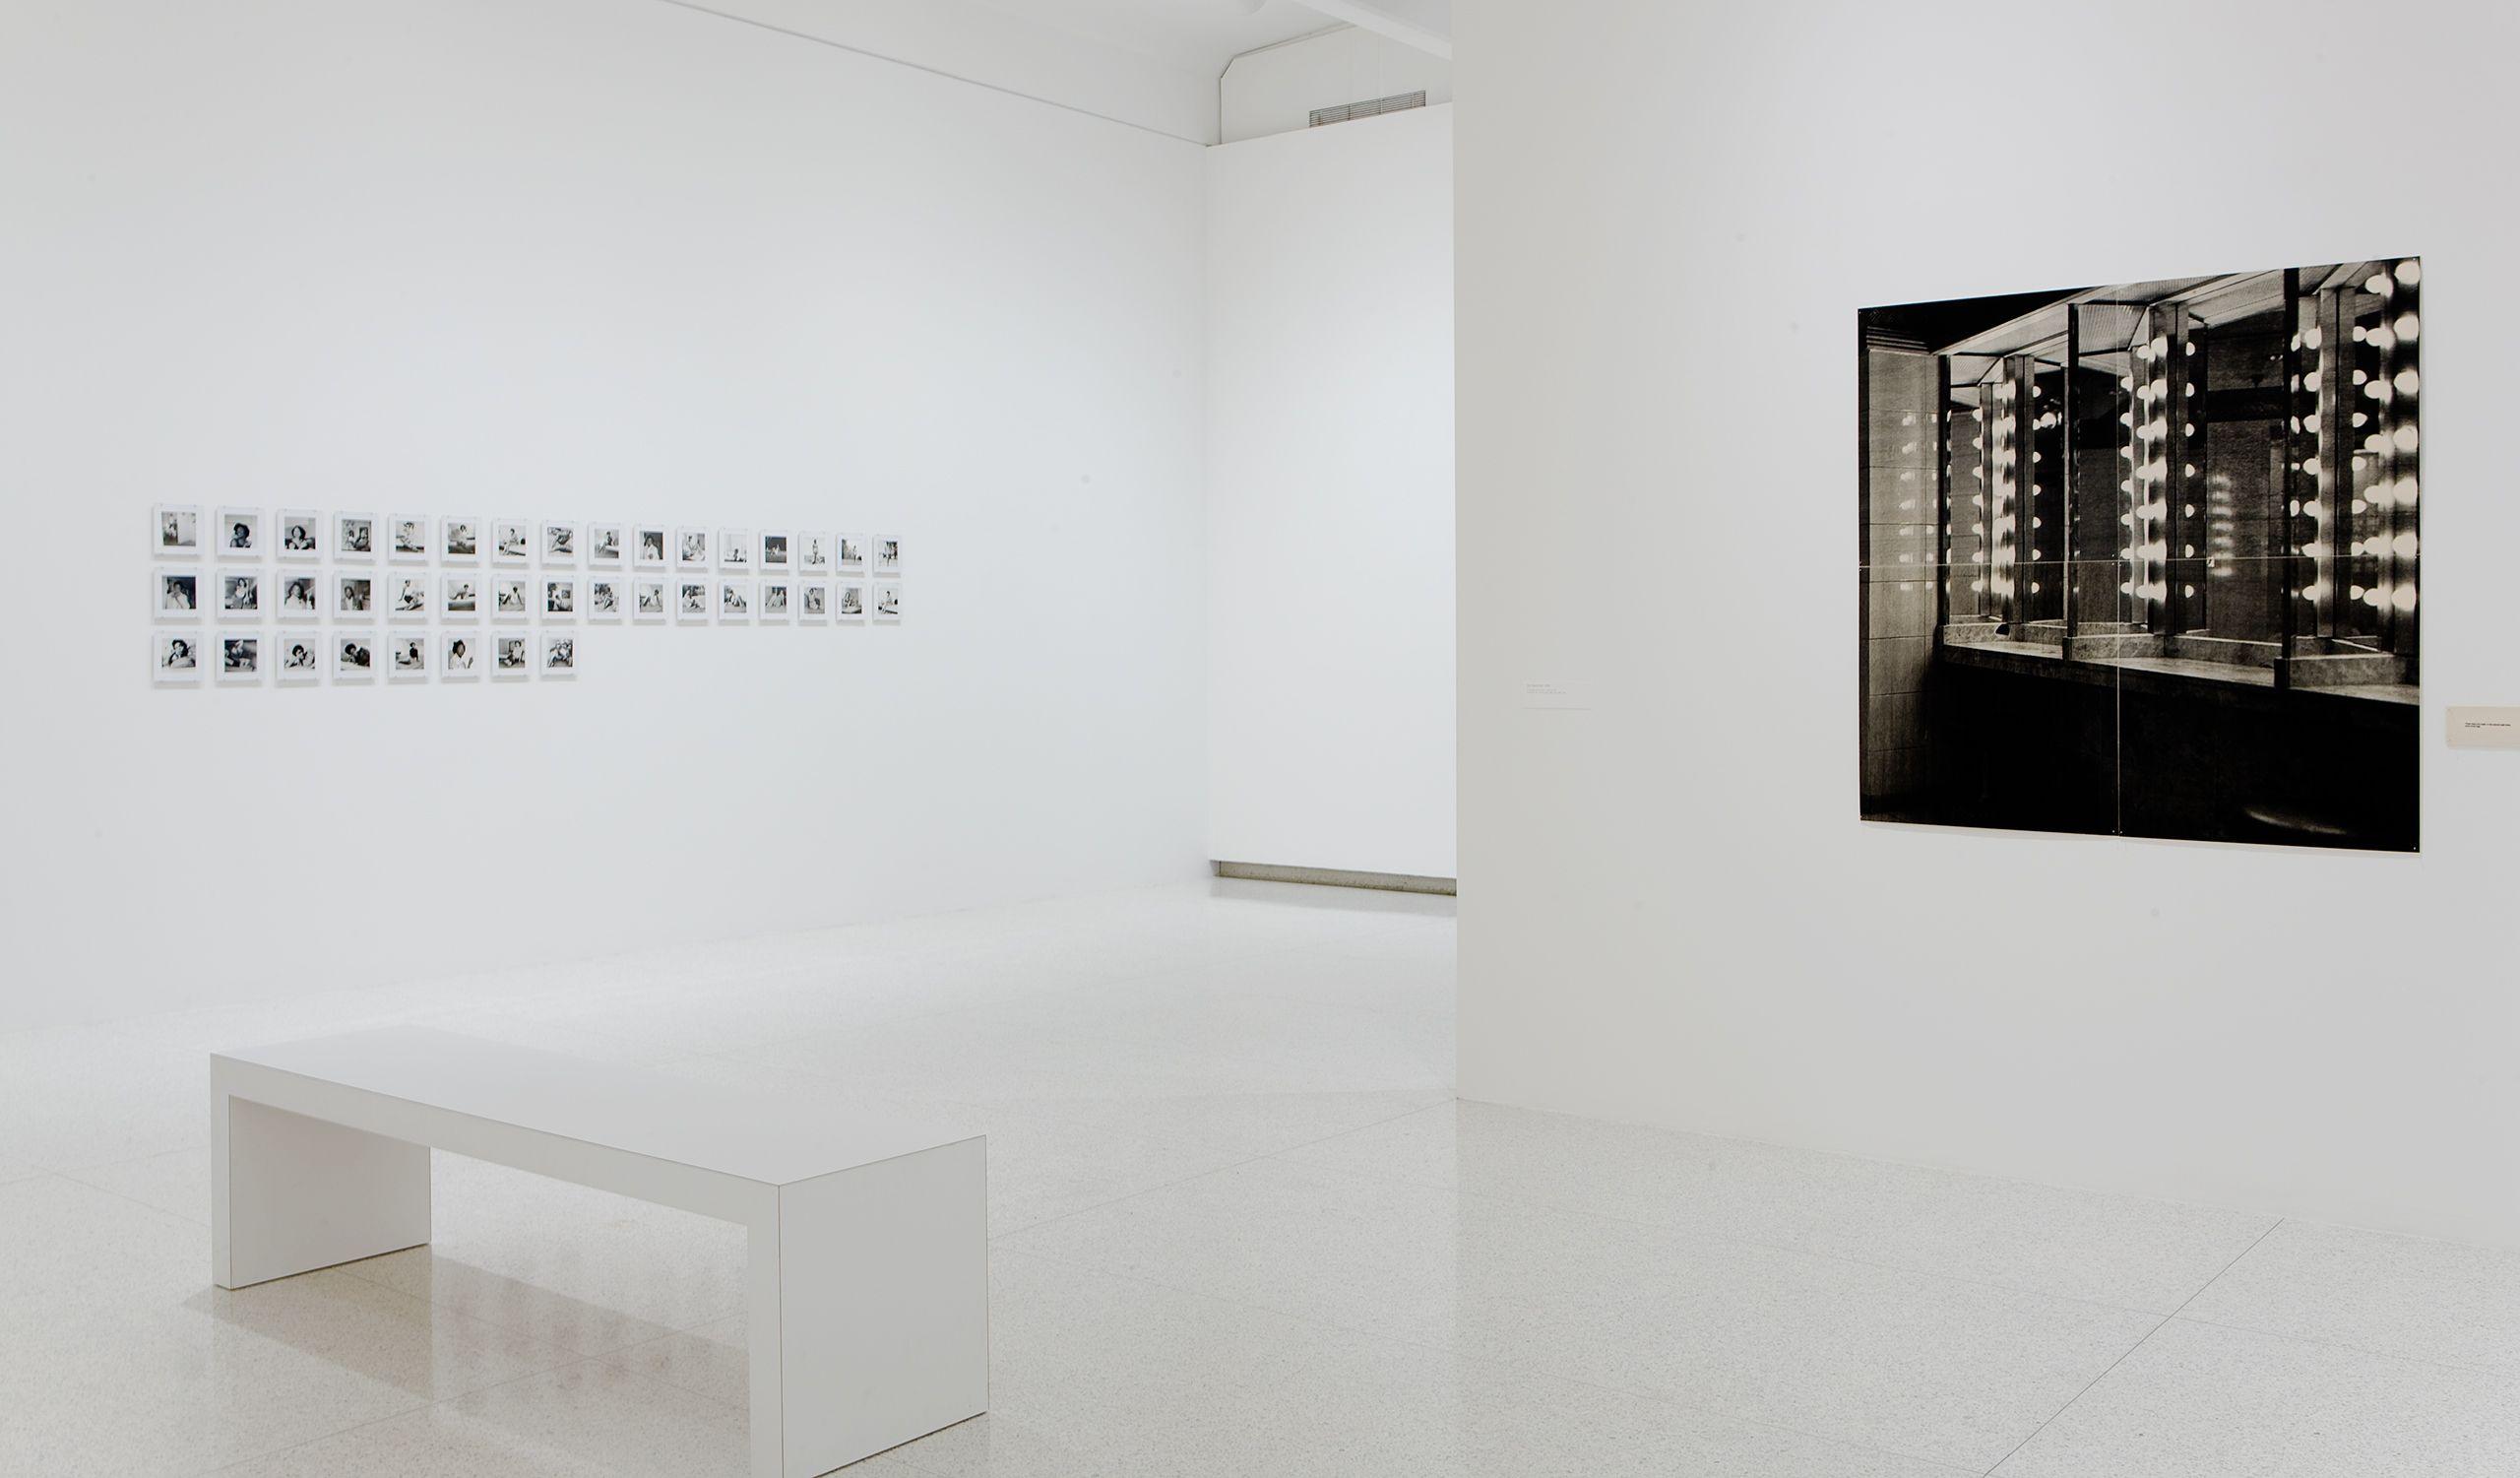 """Lorna Simpson: Recollection"", Walker Art Center, Minneapolis, MN 2010"